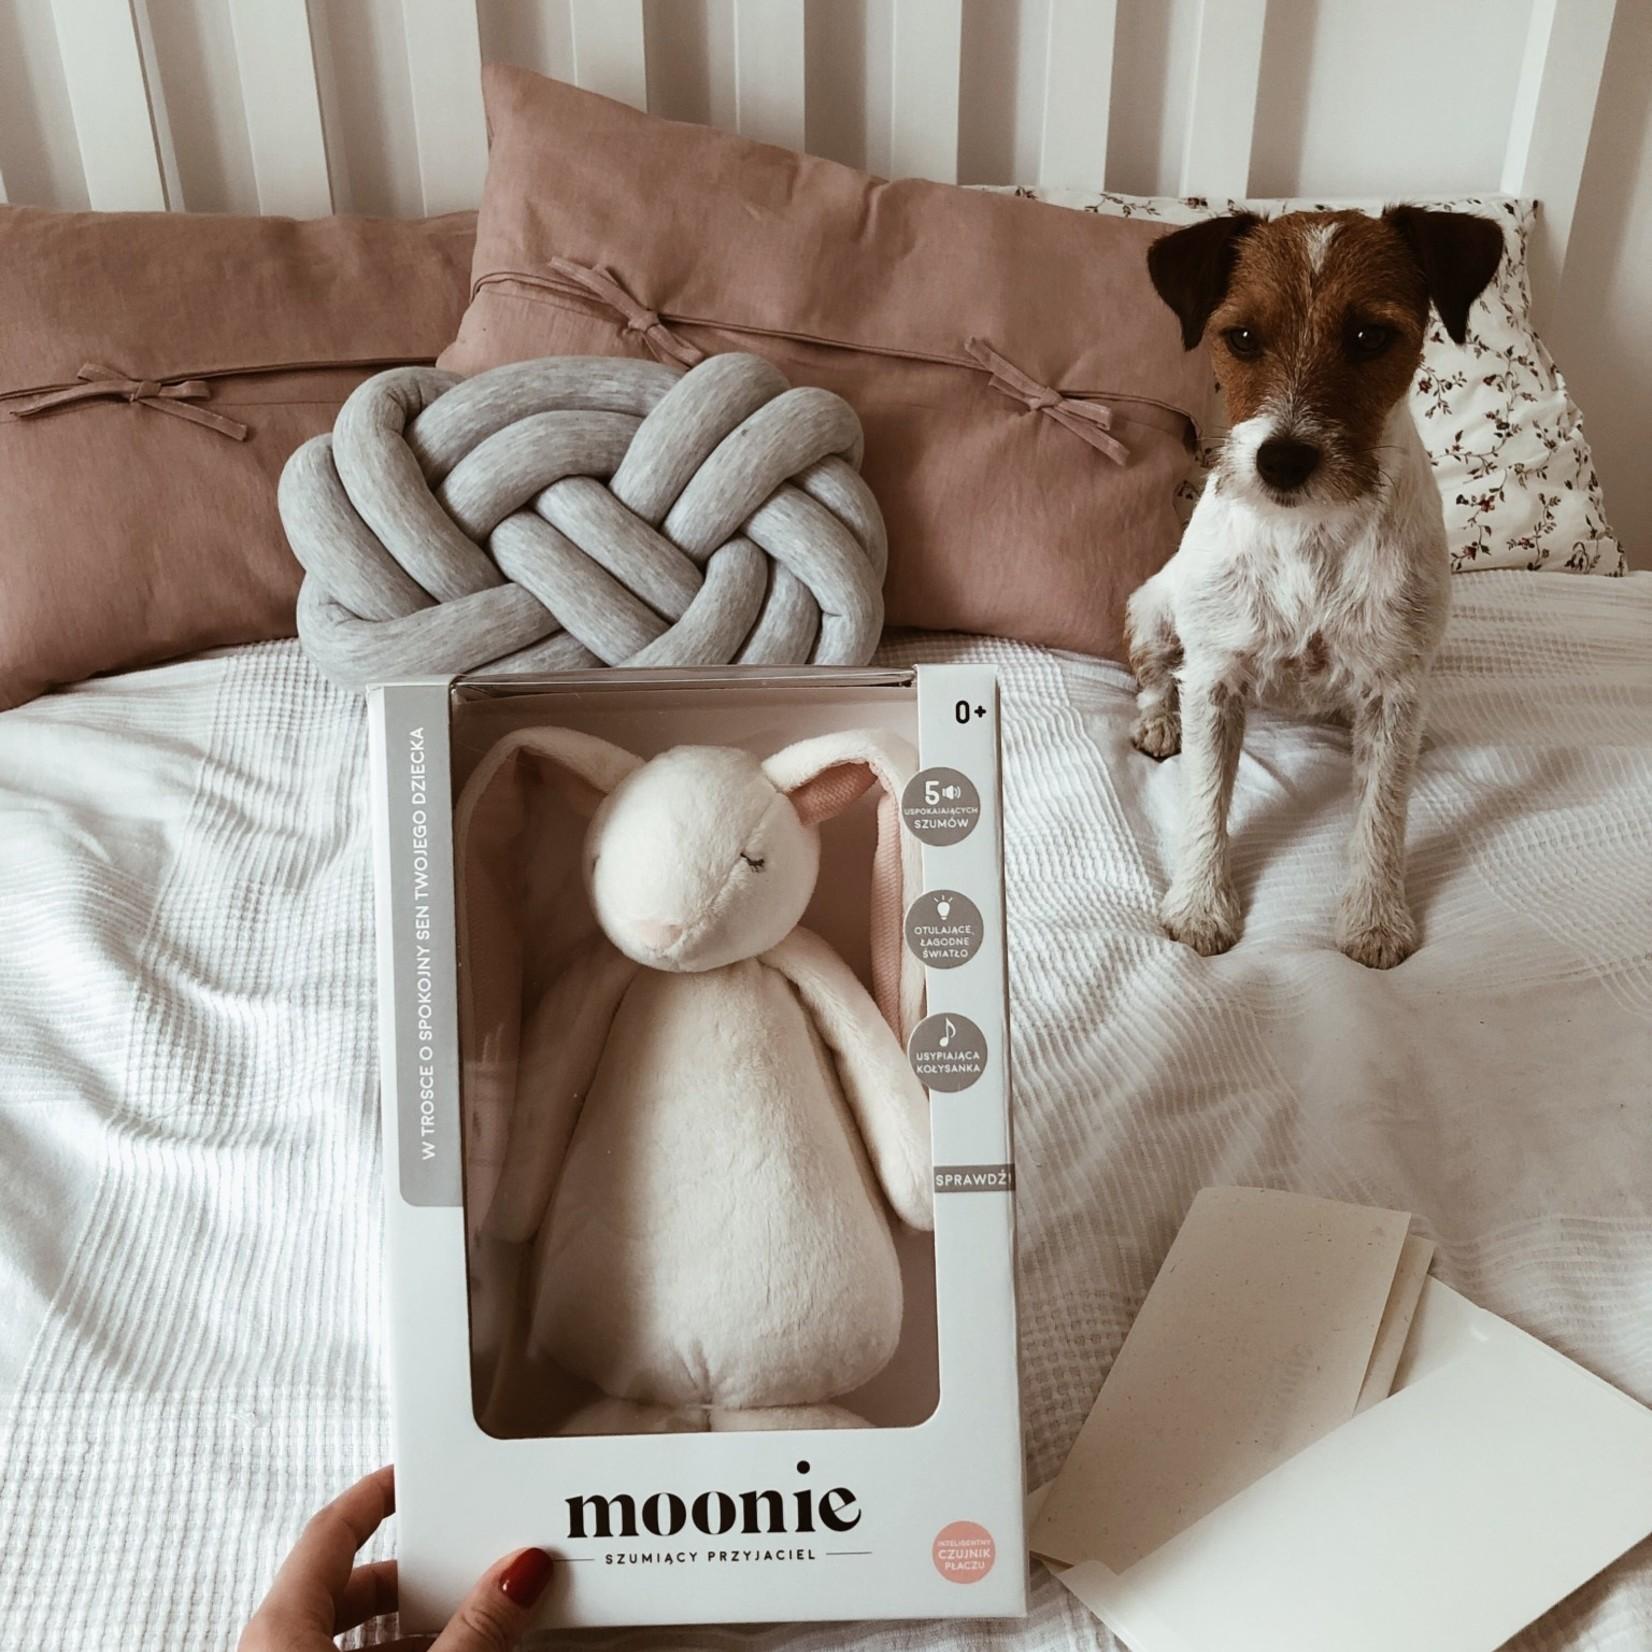 Moonie Moonie The Humming Friend Cream